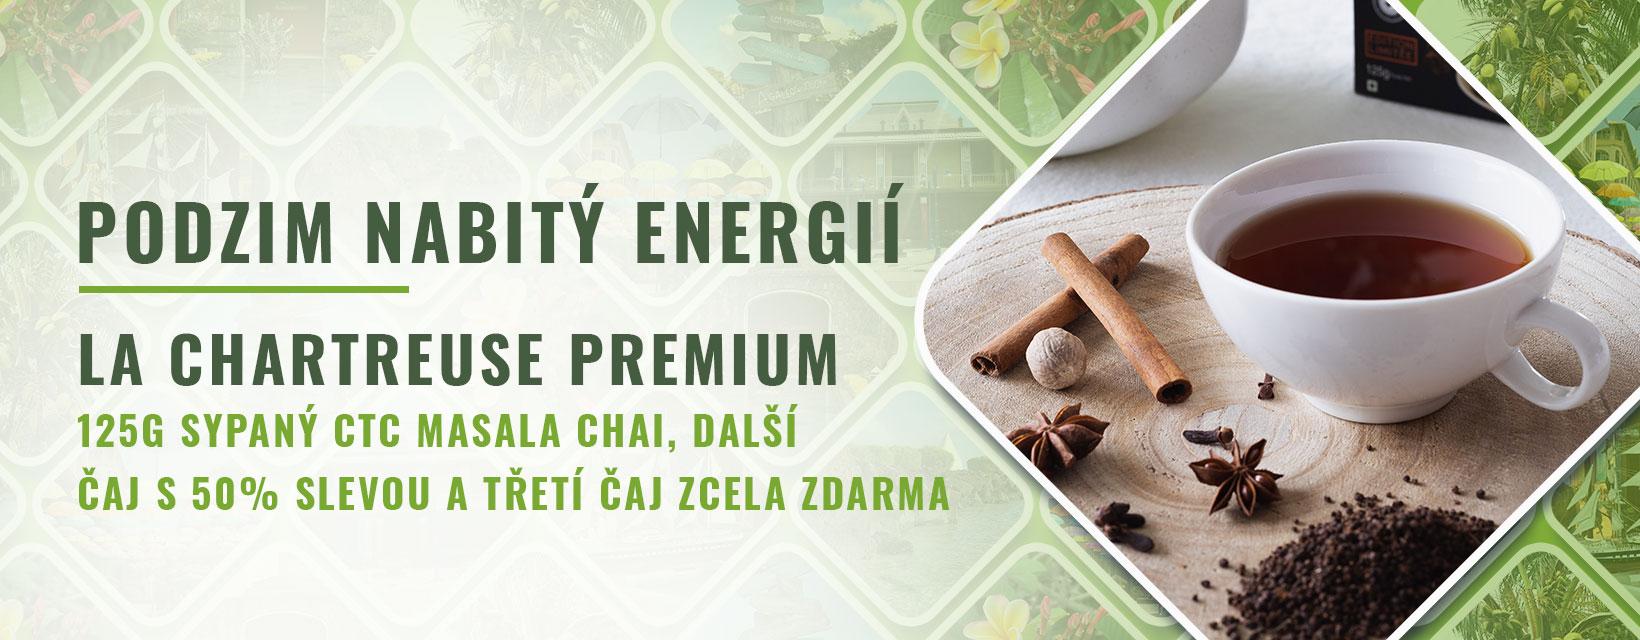 podzim nabitý energií - masala chai